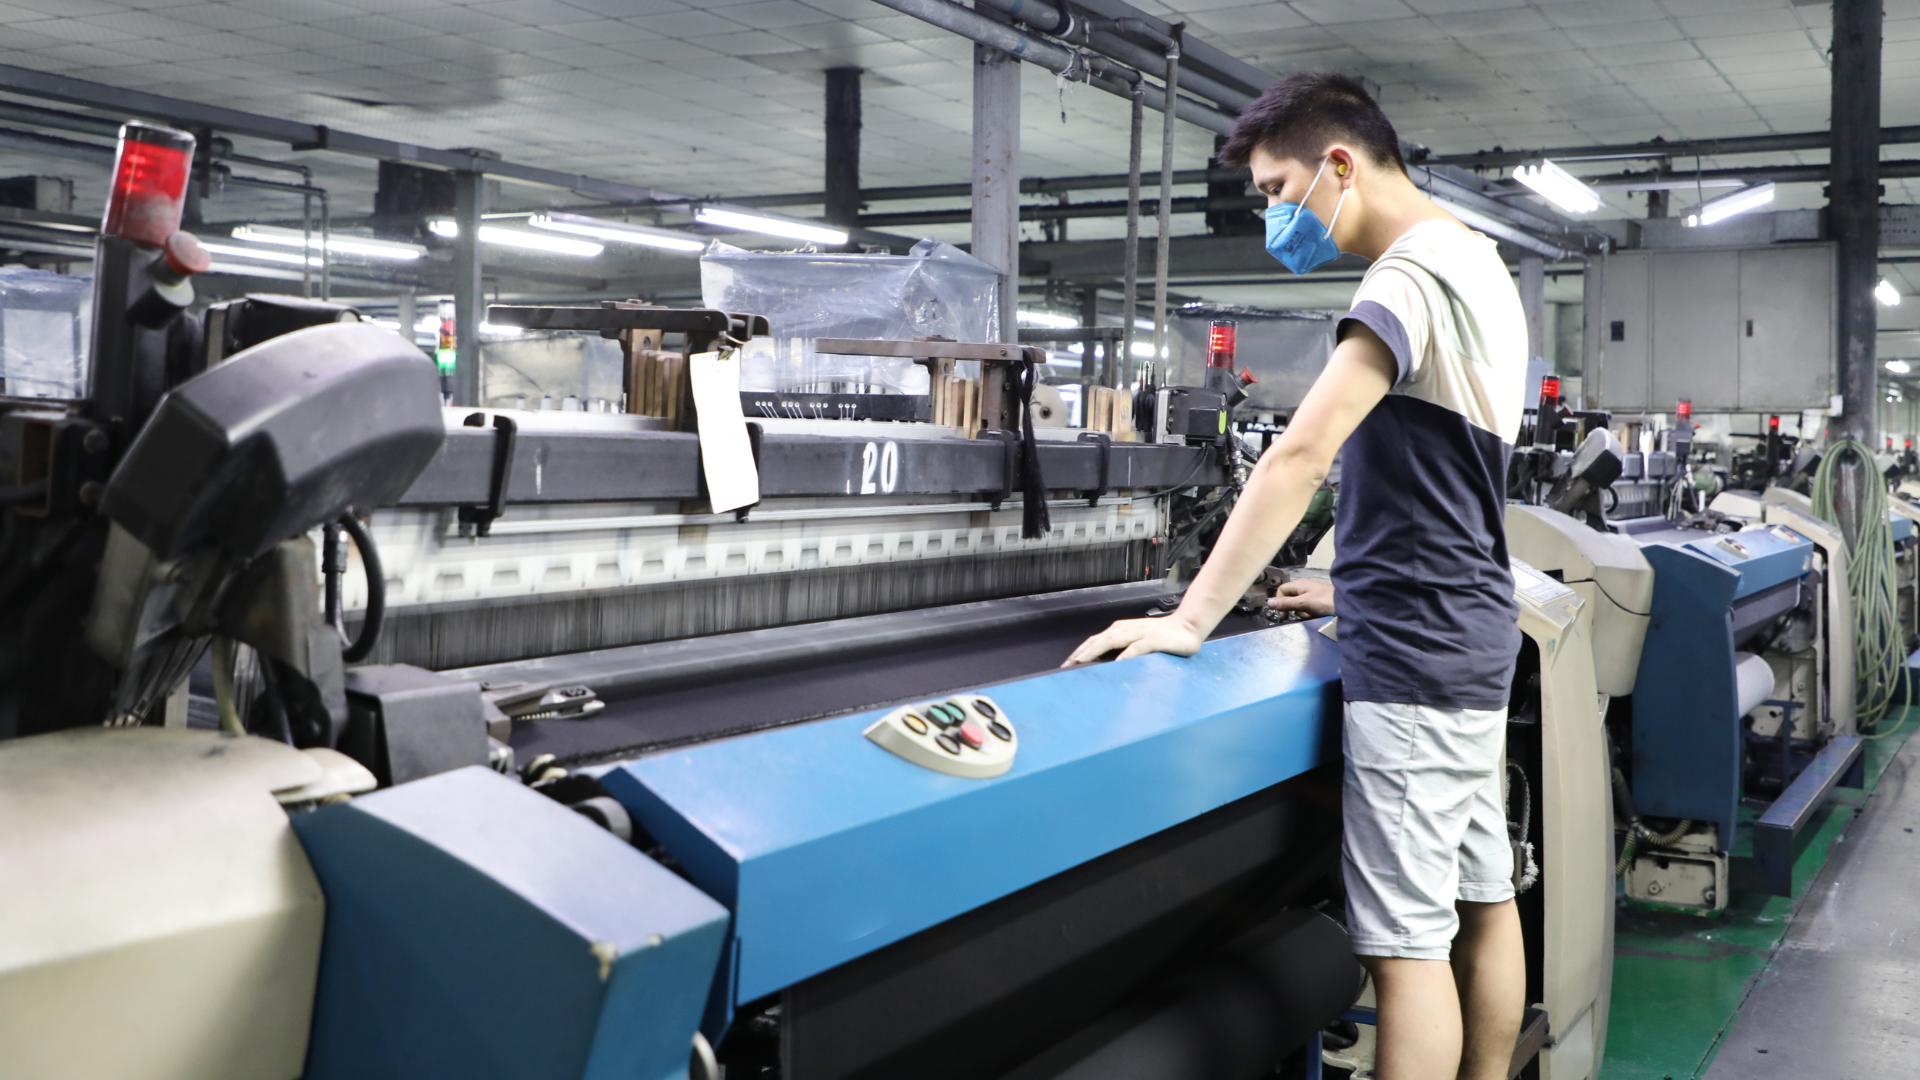 Man working with weaving machine